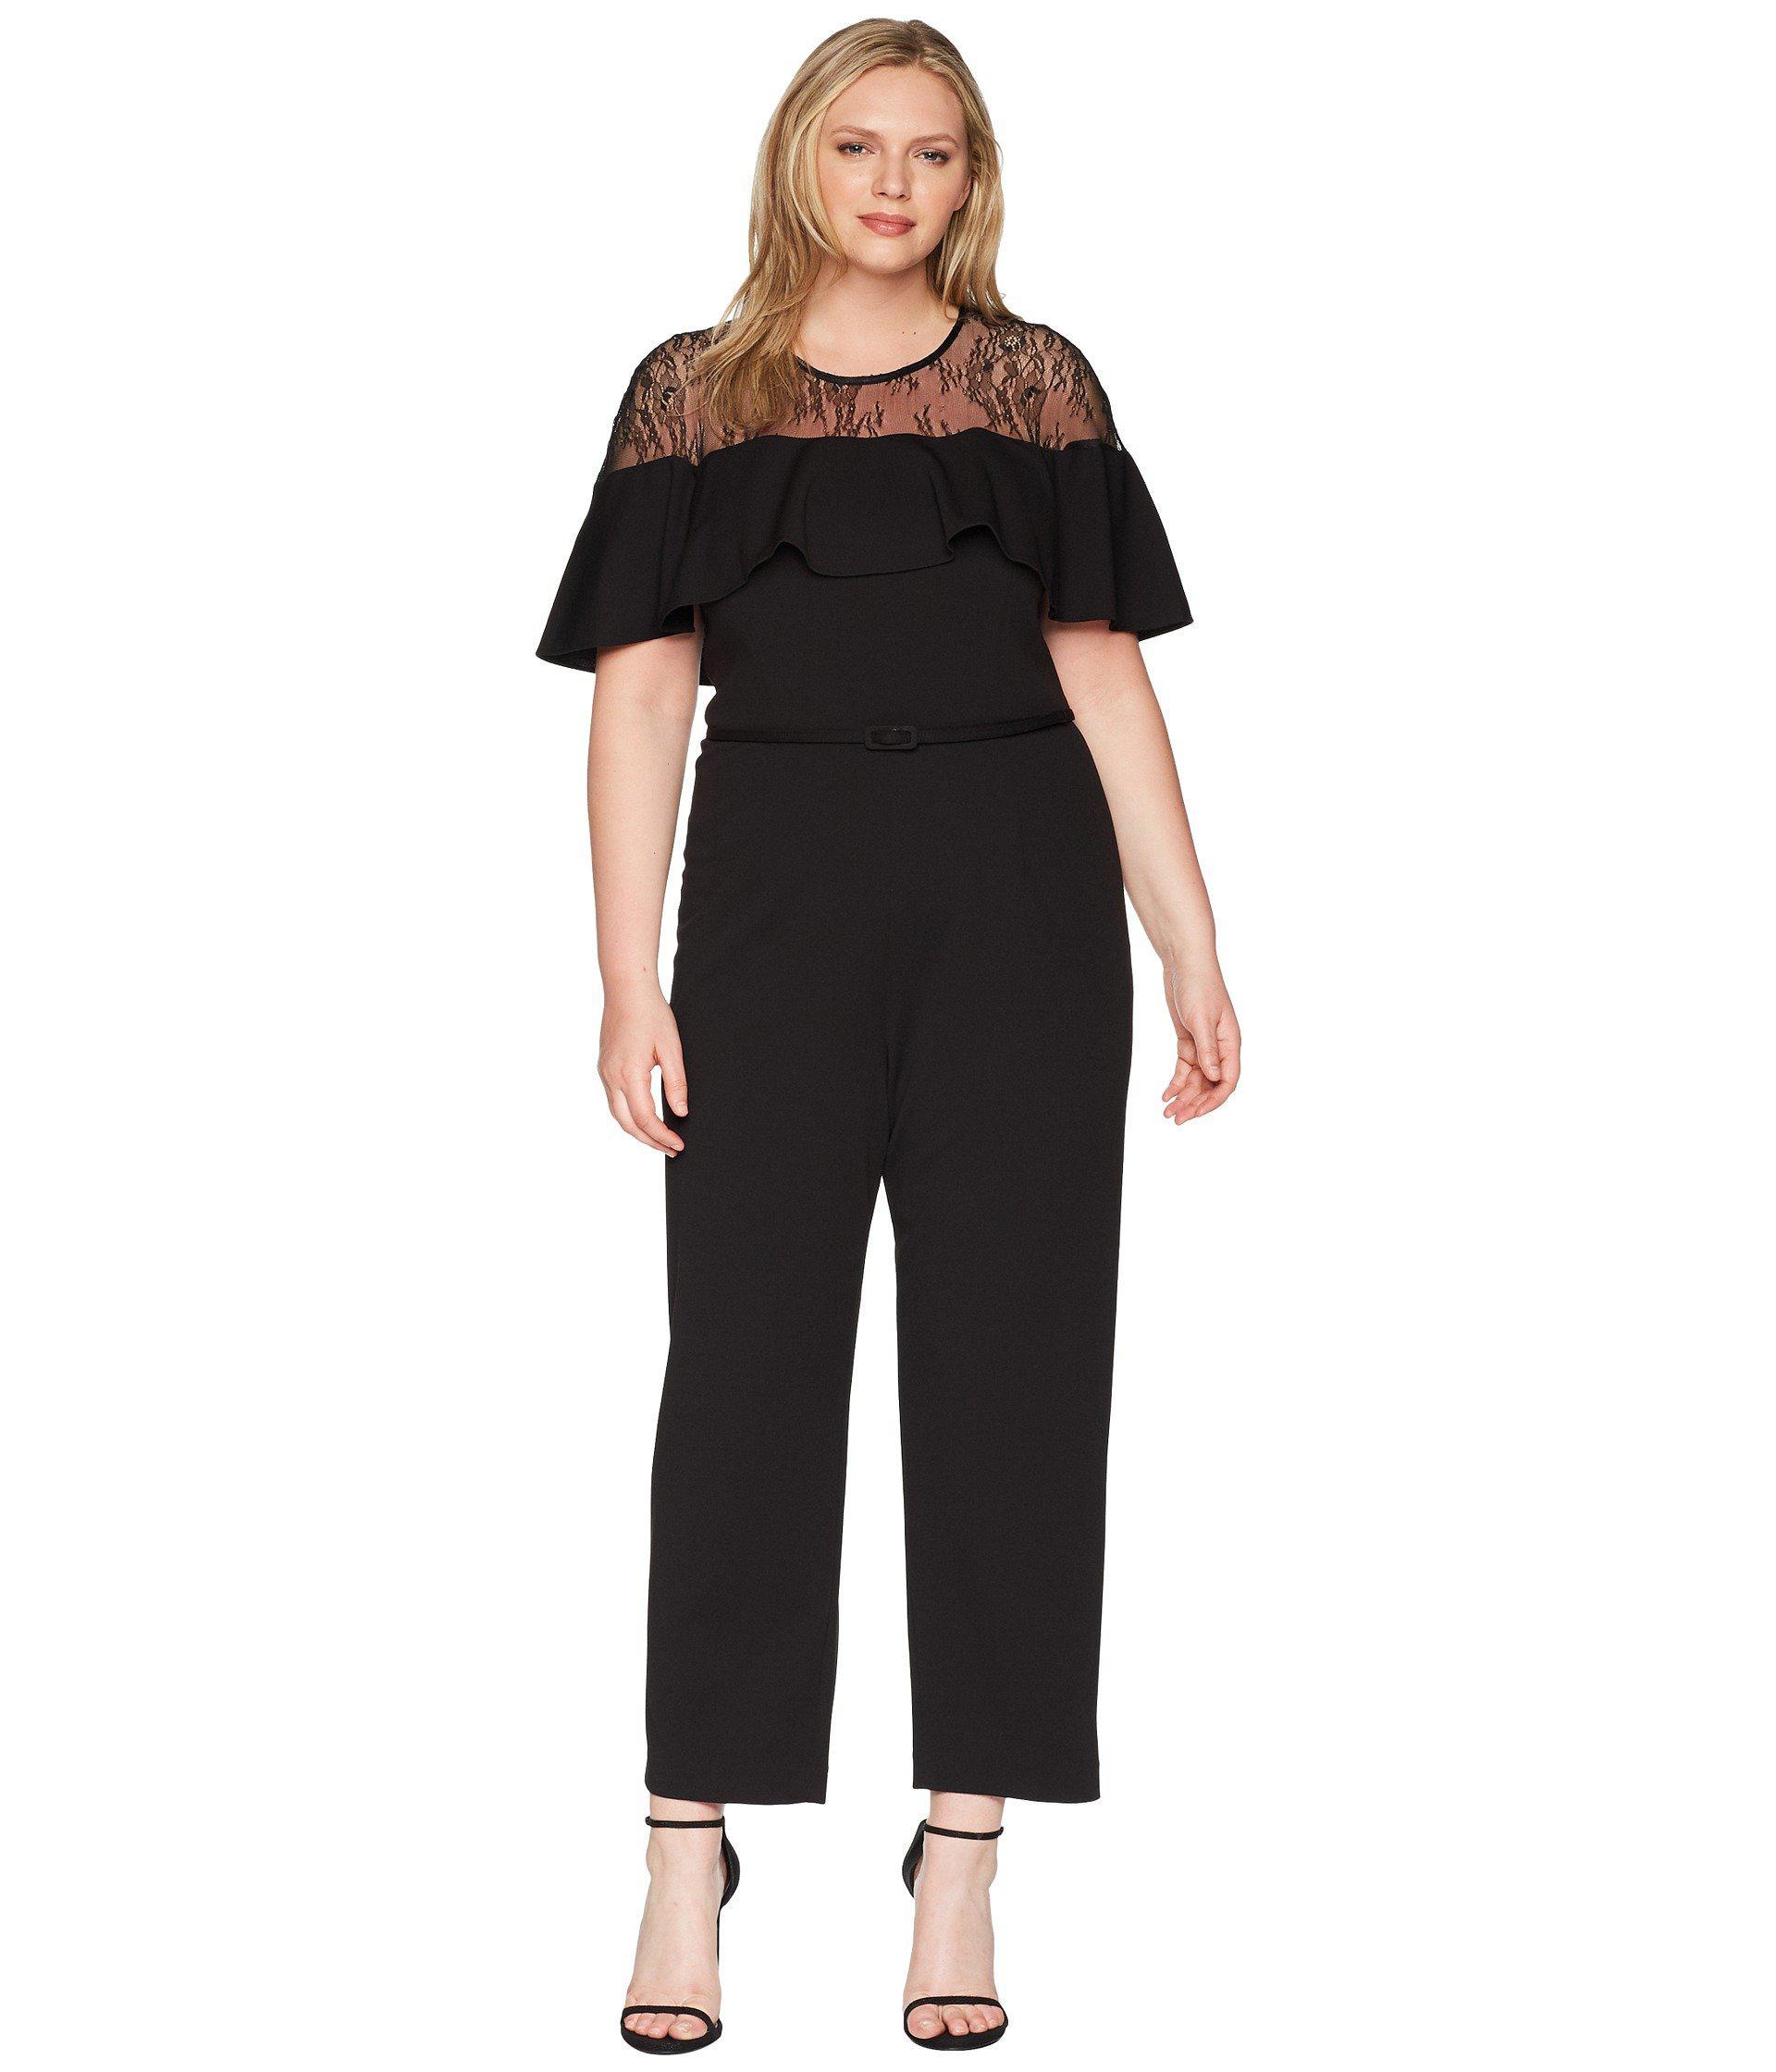 6d890c03902 Lyst - Adrianna Papell Plus Size Illusion Neckline Jumpsuit in Black ...